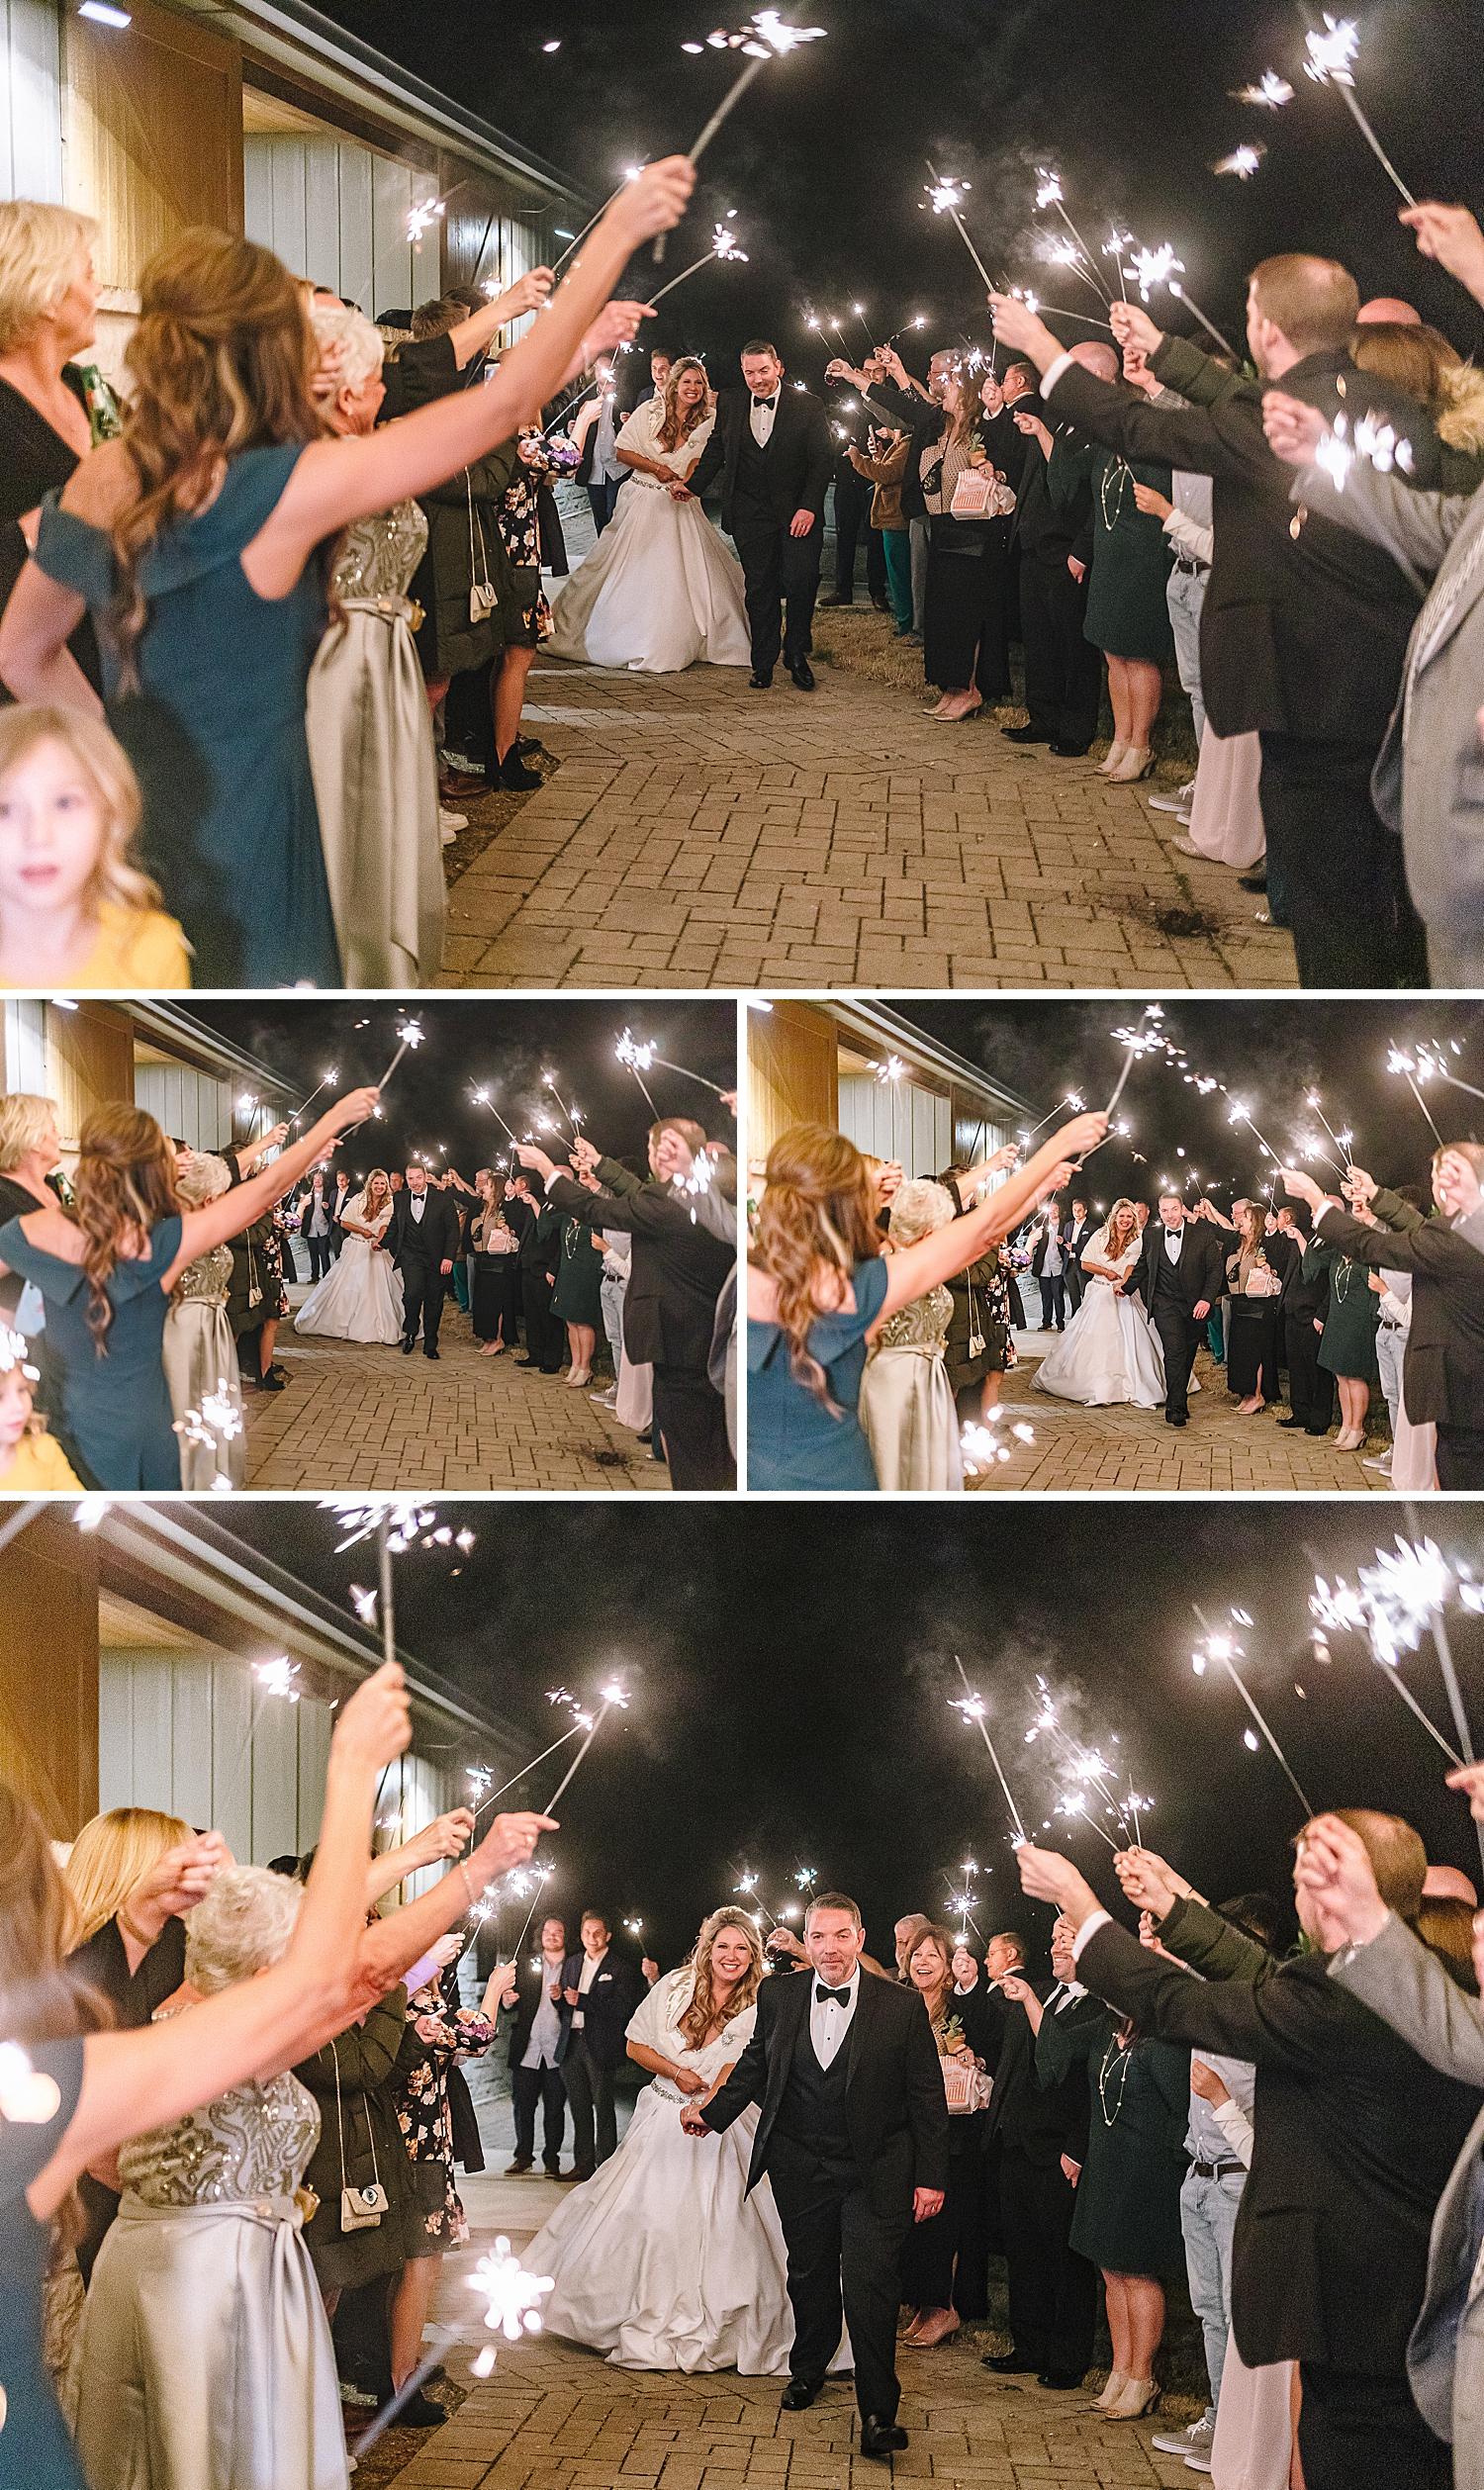 Magnolia-Halle-Wedding-San-Antonio-Texas-Bride-Grom_0075.jpg